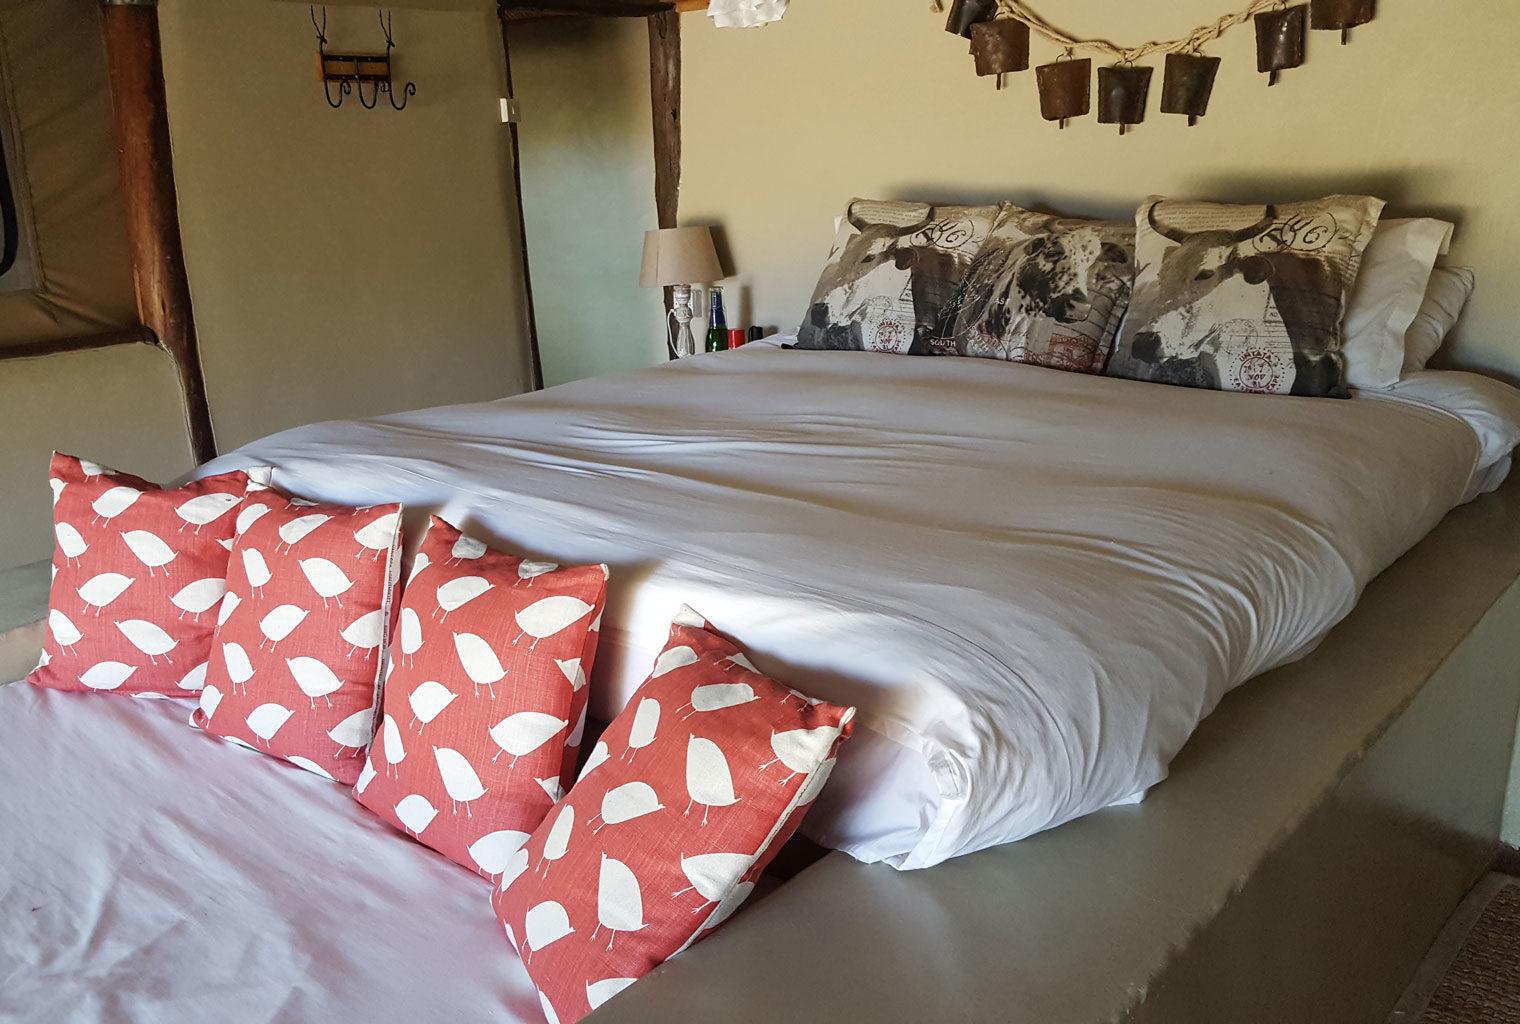 House-In-The-Wild-Kenya-Enonkishu-Bedroom